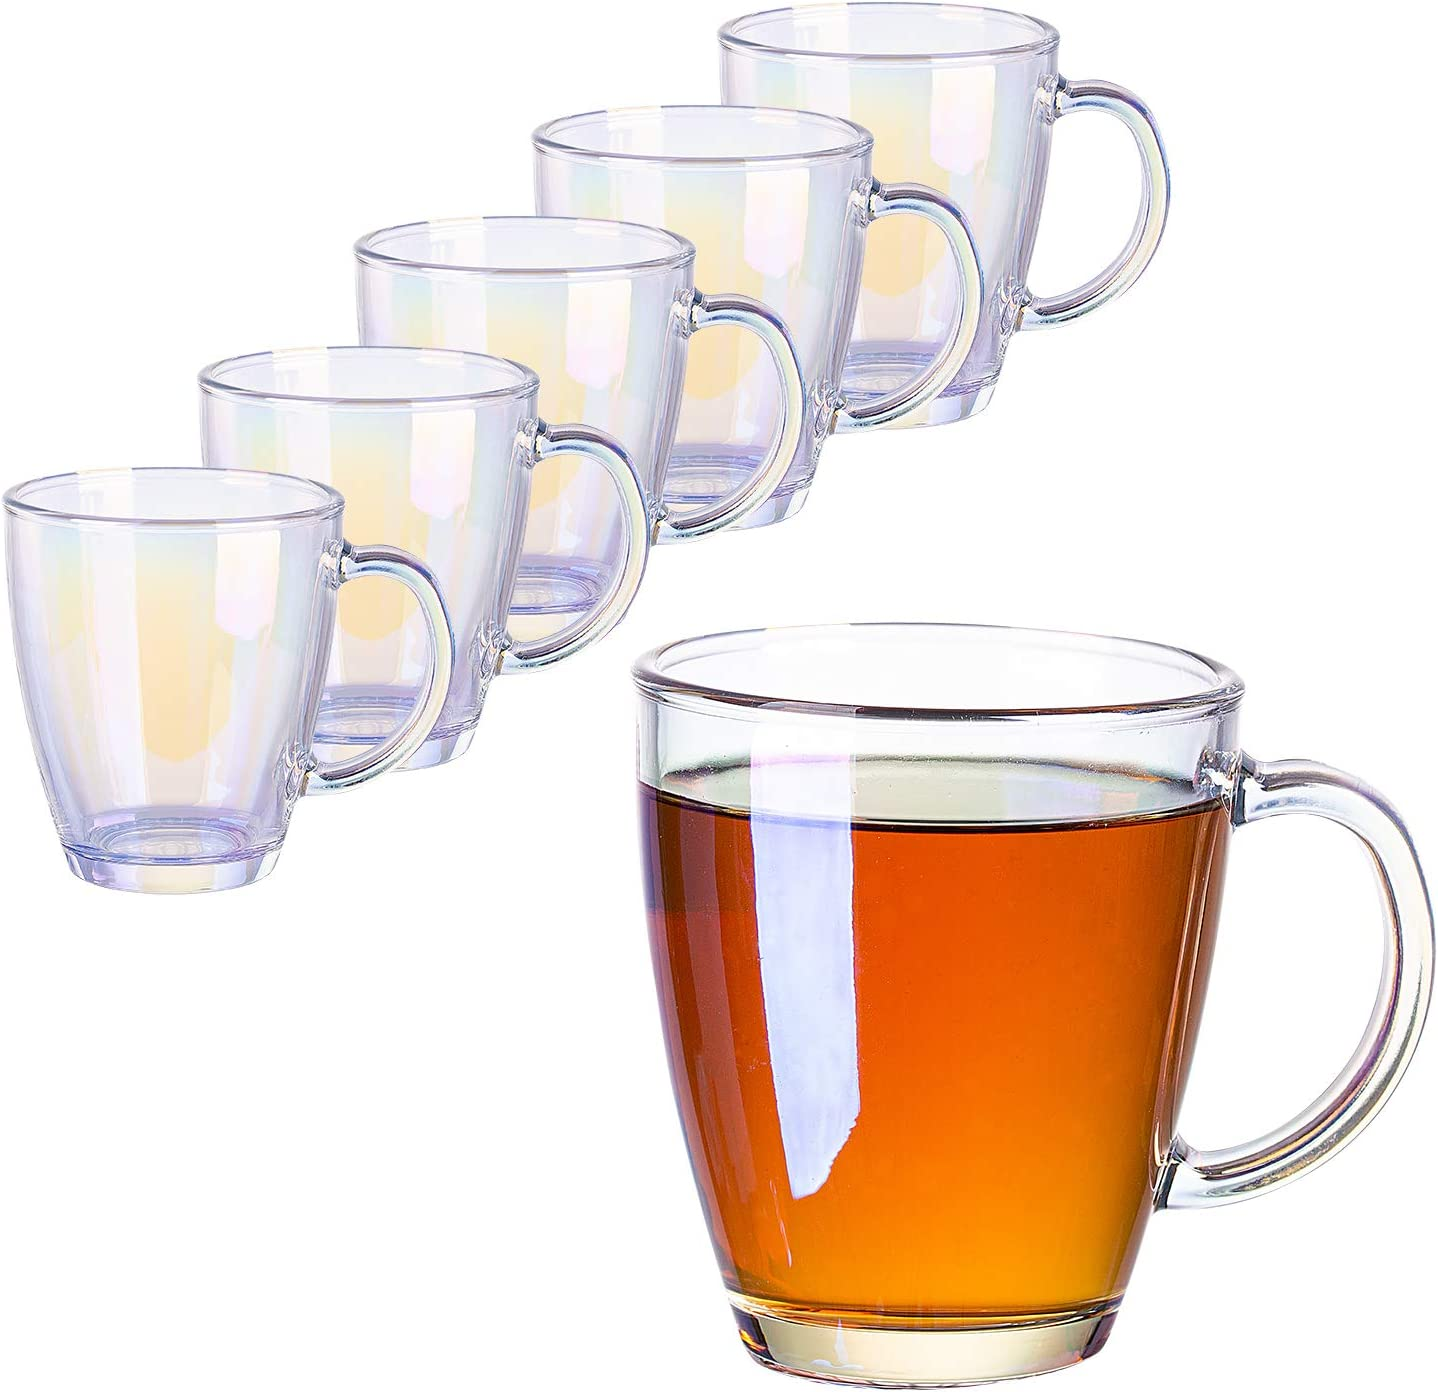 SUNNOW Vastto 11 Ounce Iridescent Coffee Mug Warm Beverage Mug,for Latte,Cappuccino,Hot Chocolate,Tea and Juice,Set of 6 (Rainbow-colored)